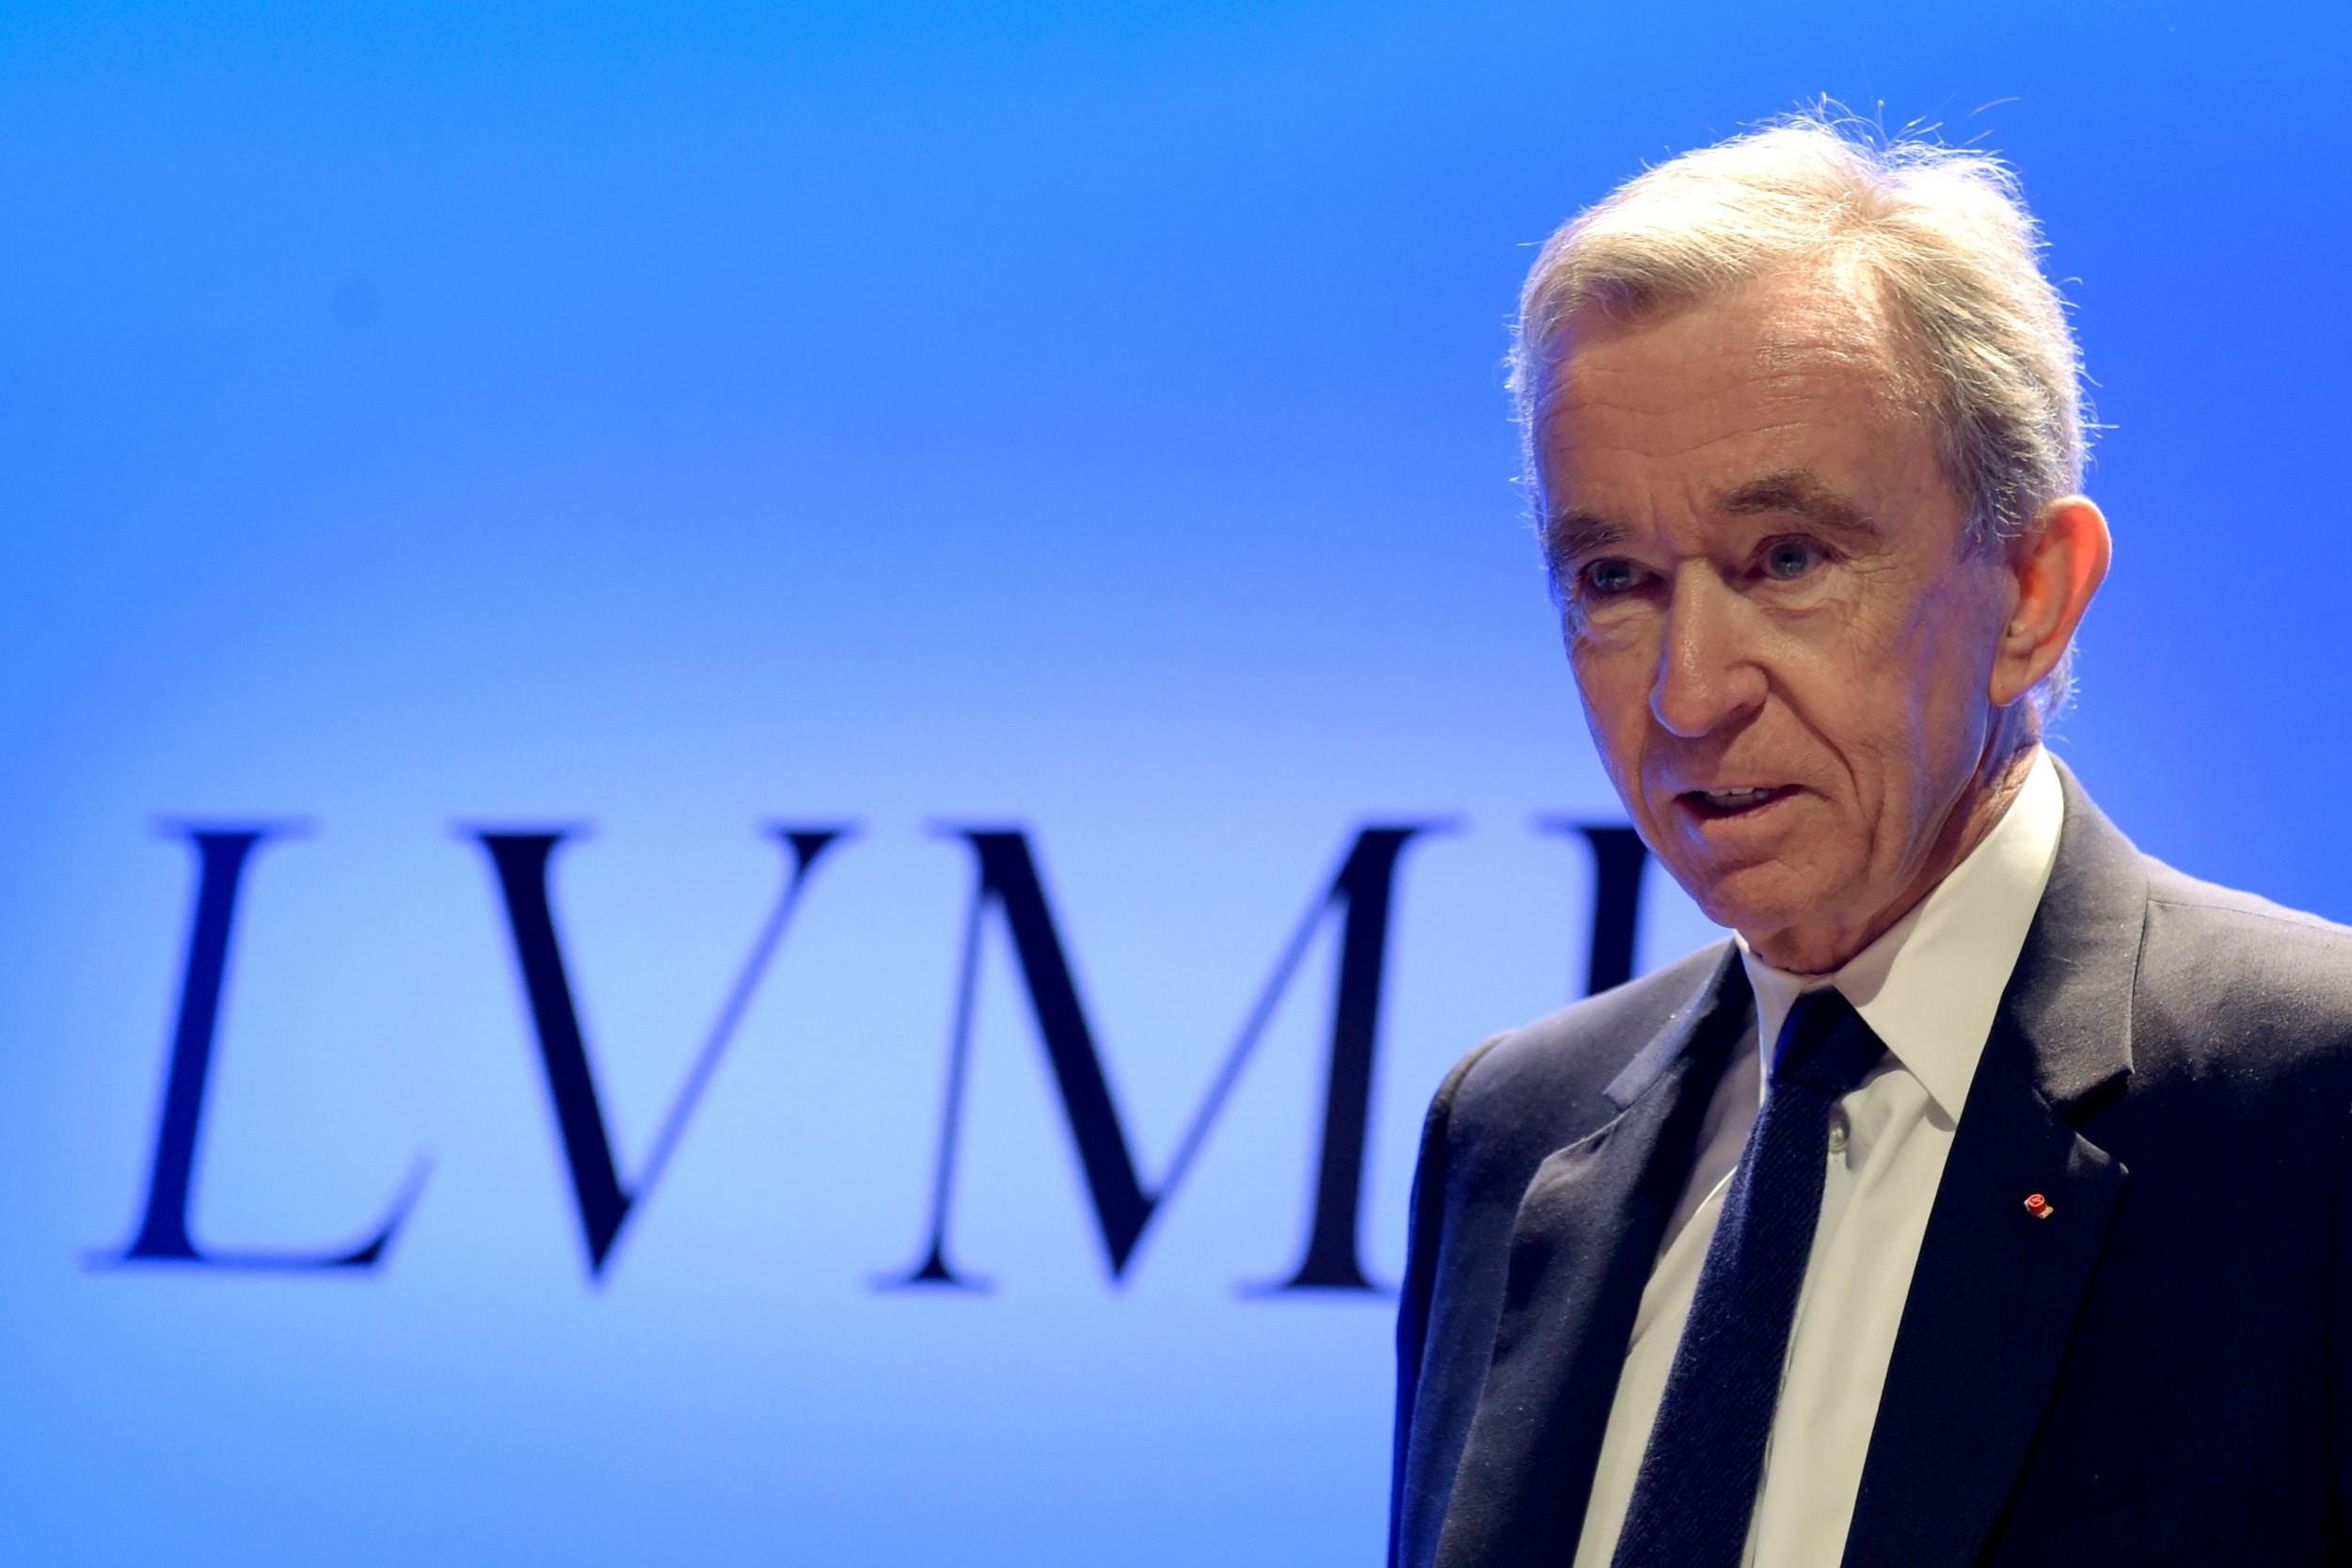 de82eb80fad Moët Hennessy–Louis Vuitton CEO Bernard Arnault is the Newest Member in the $100  Billion Club